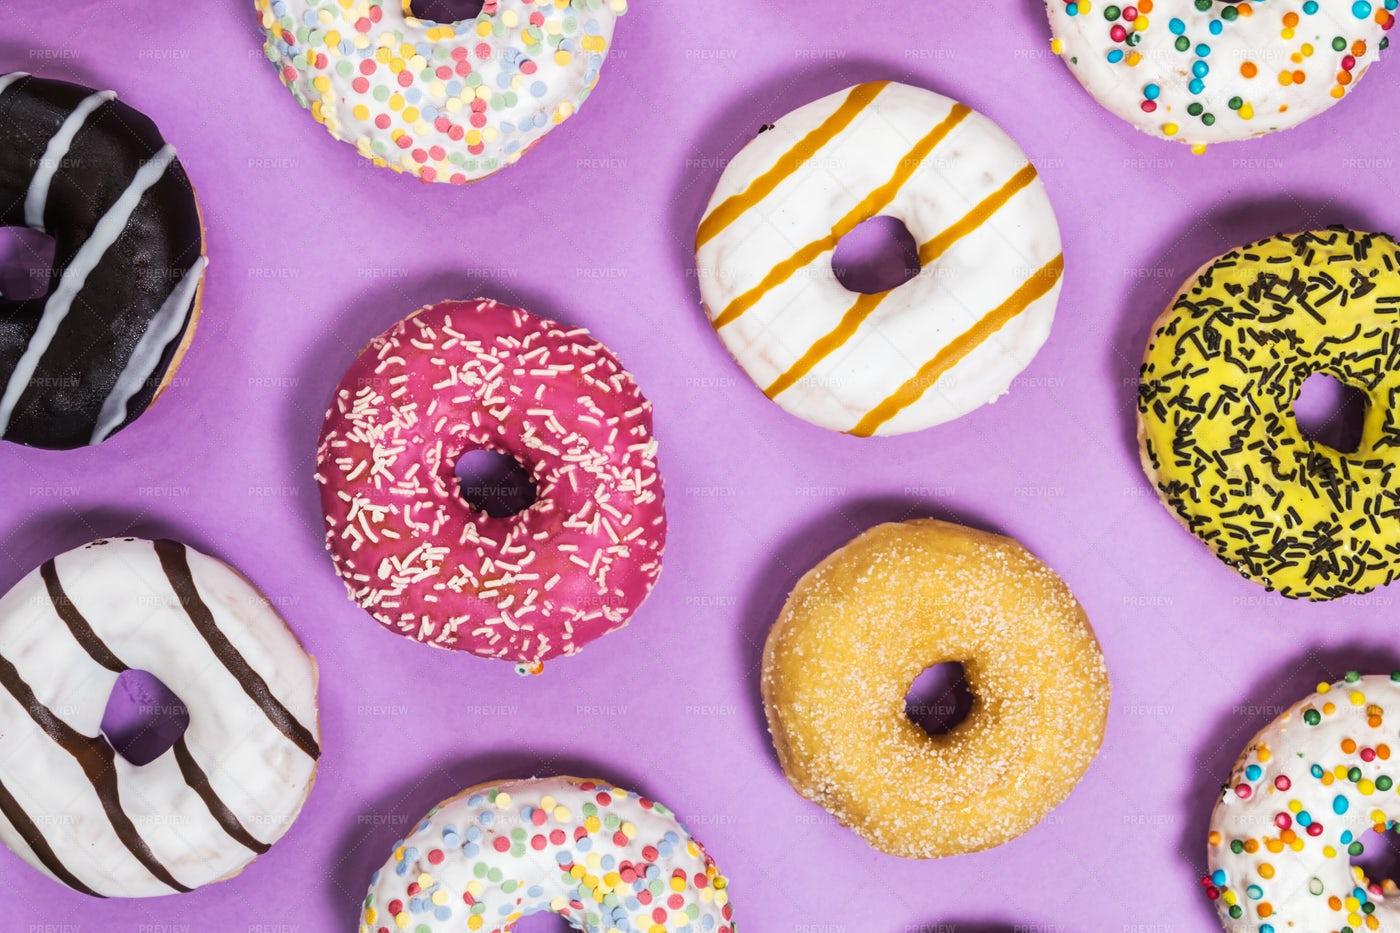 Variety Of Donuts: Stock Photos